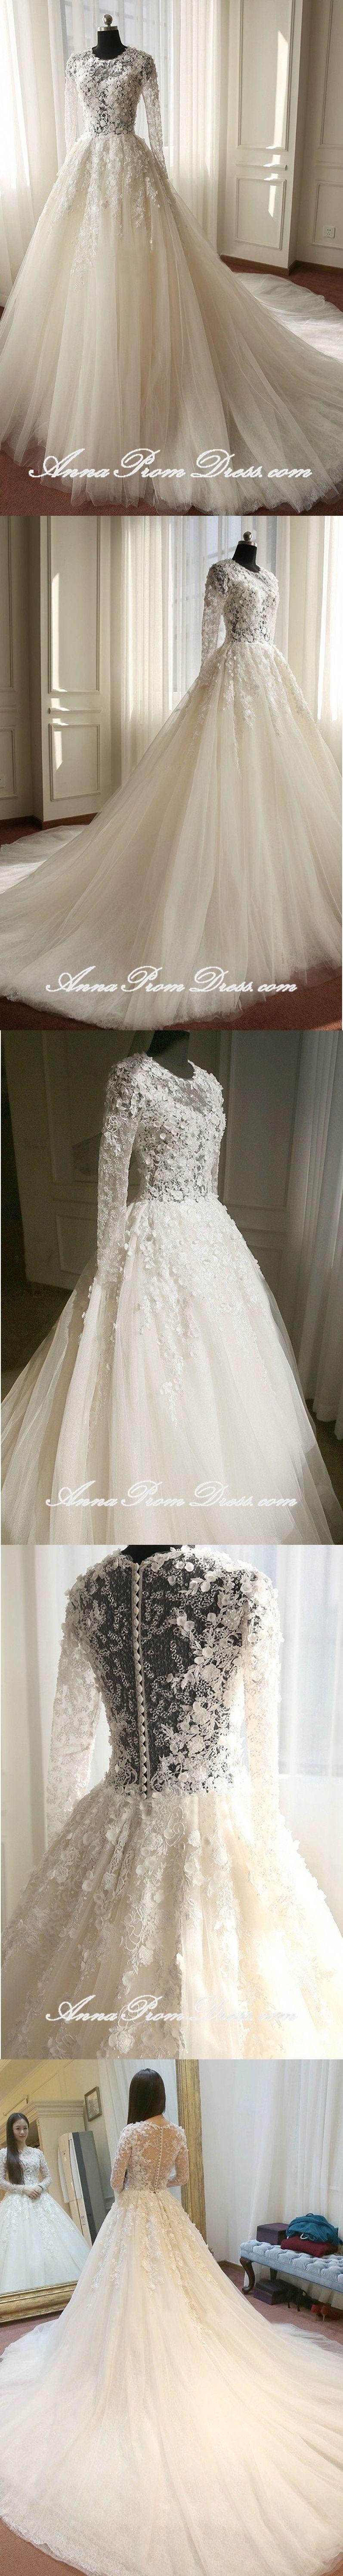 Rent designer wedding dress  Lace Wedding Dresses Scoop Aline Brush Train Long Sleeve Luxury